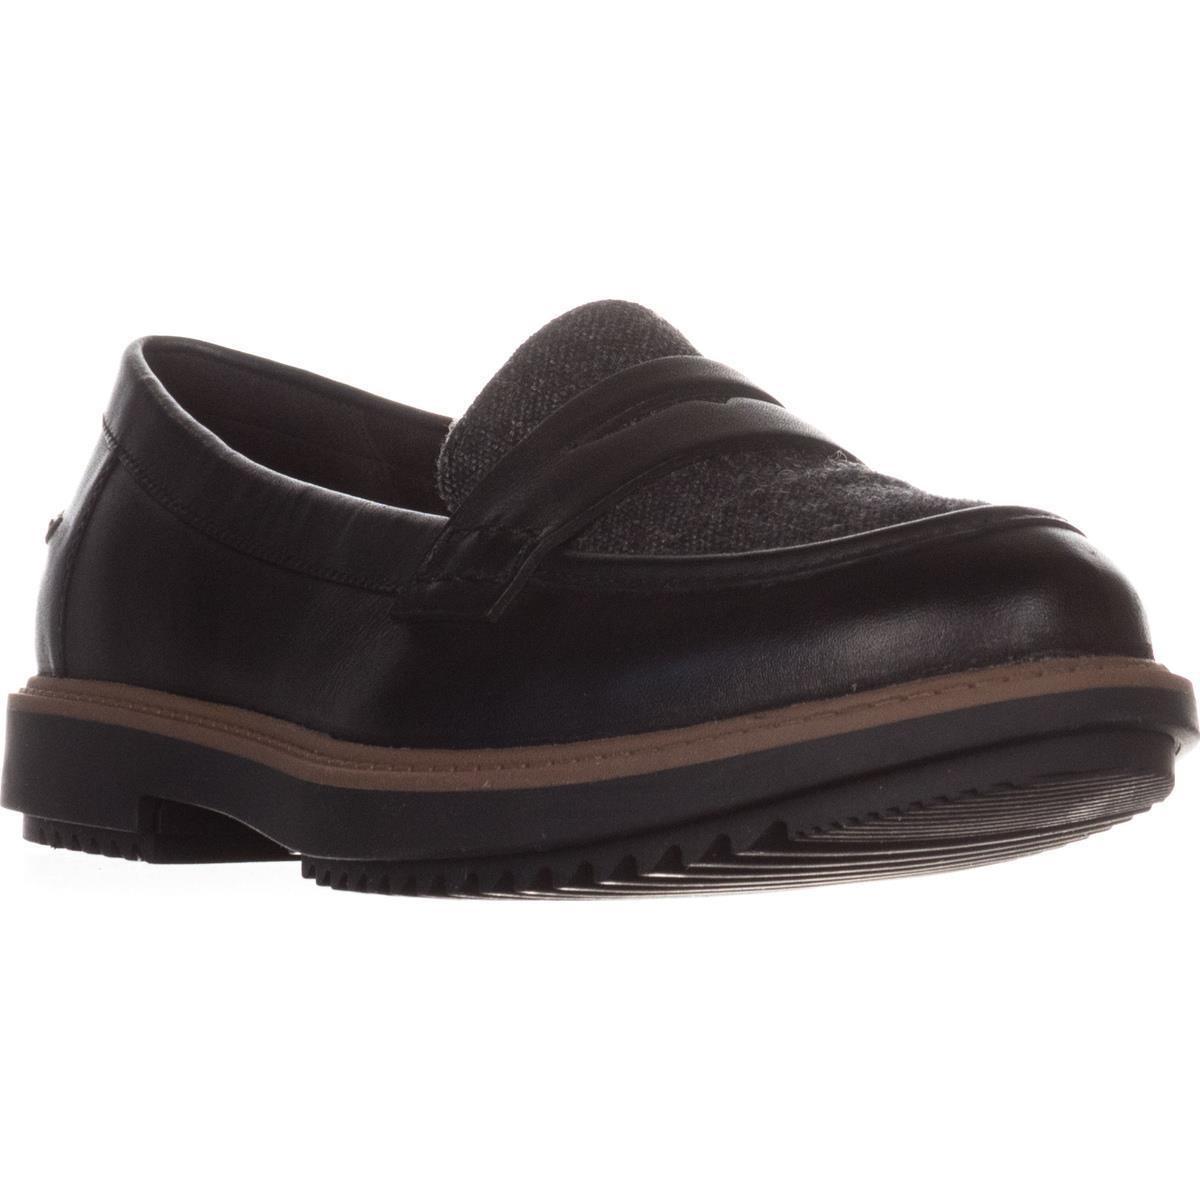 2030d02550a Lyst - Clarks Raisie Eletta Comfort Penny Loafers in Black